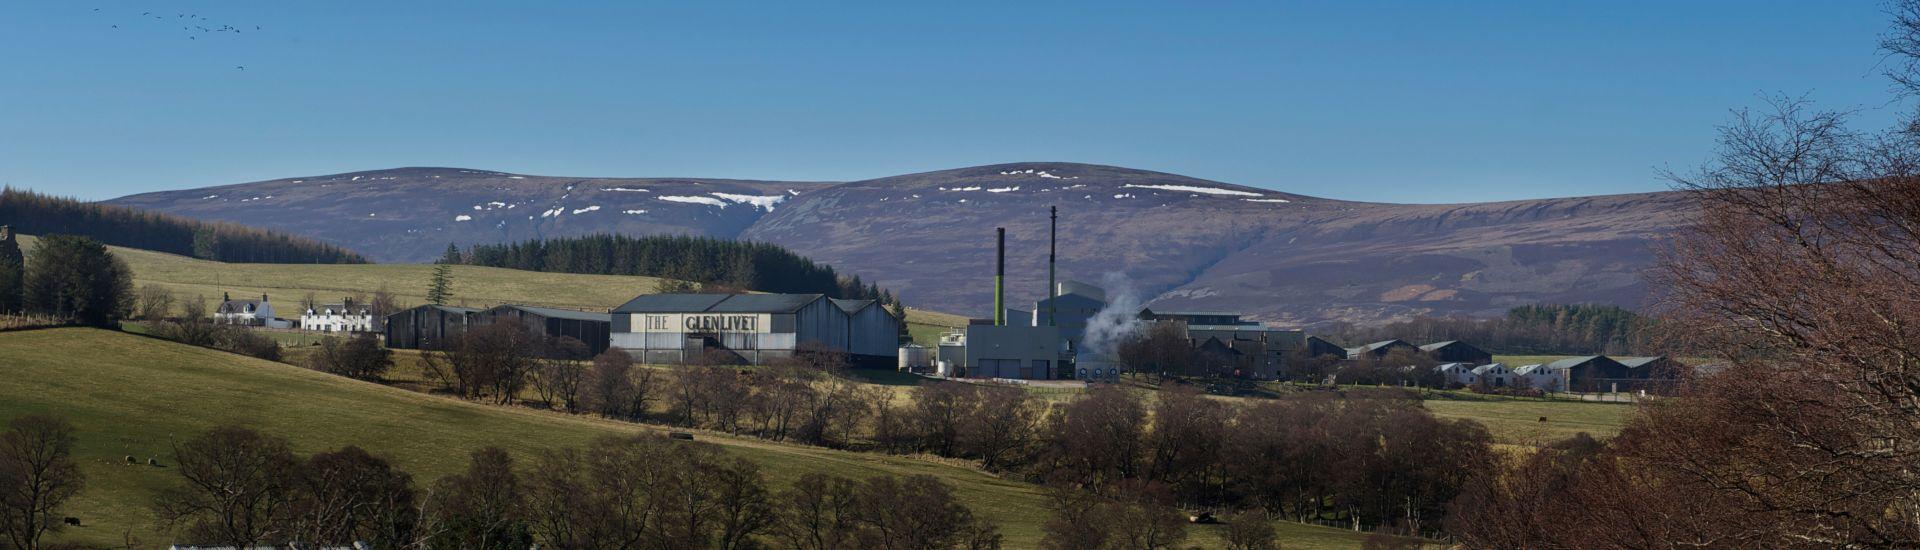 enabling-major-distilleries-to-reduce-their-carbon-impact-1-case-banner.jpg